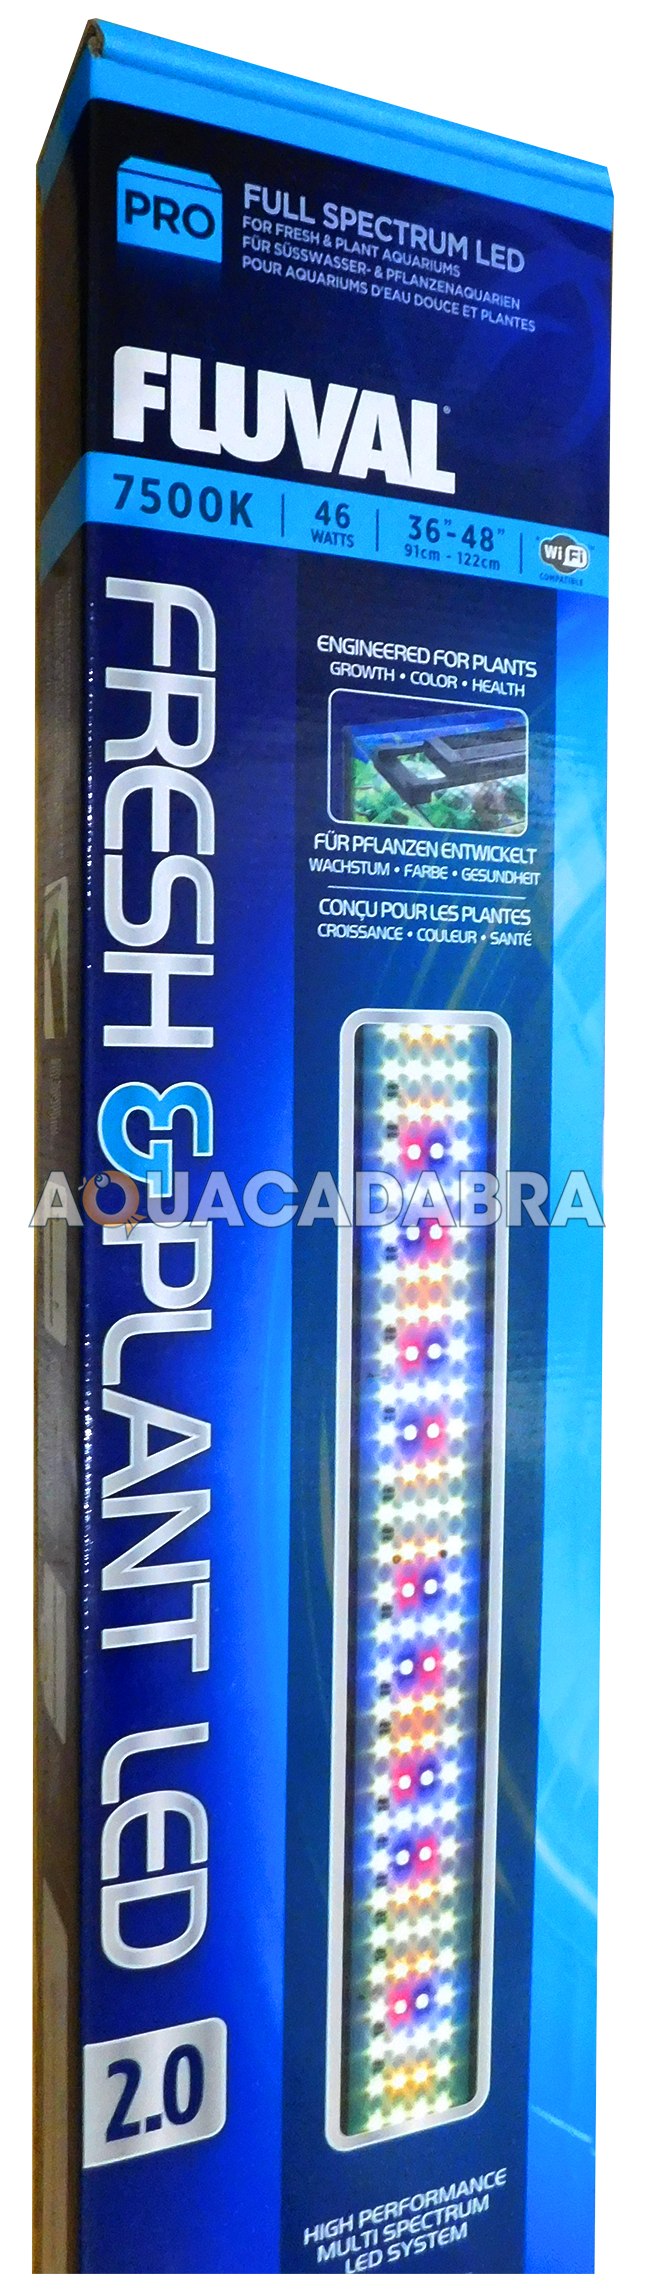 Aquarium fish tank ebay - Fluval Fresh Plant Led 2 0 Lighting Lamp Full Spectrum Aquarium Fish Tank